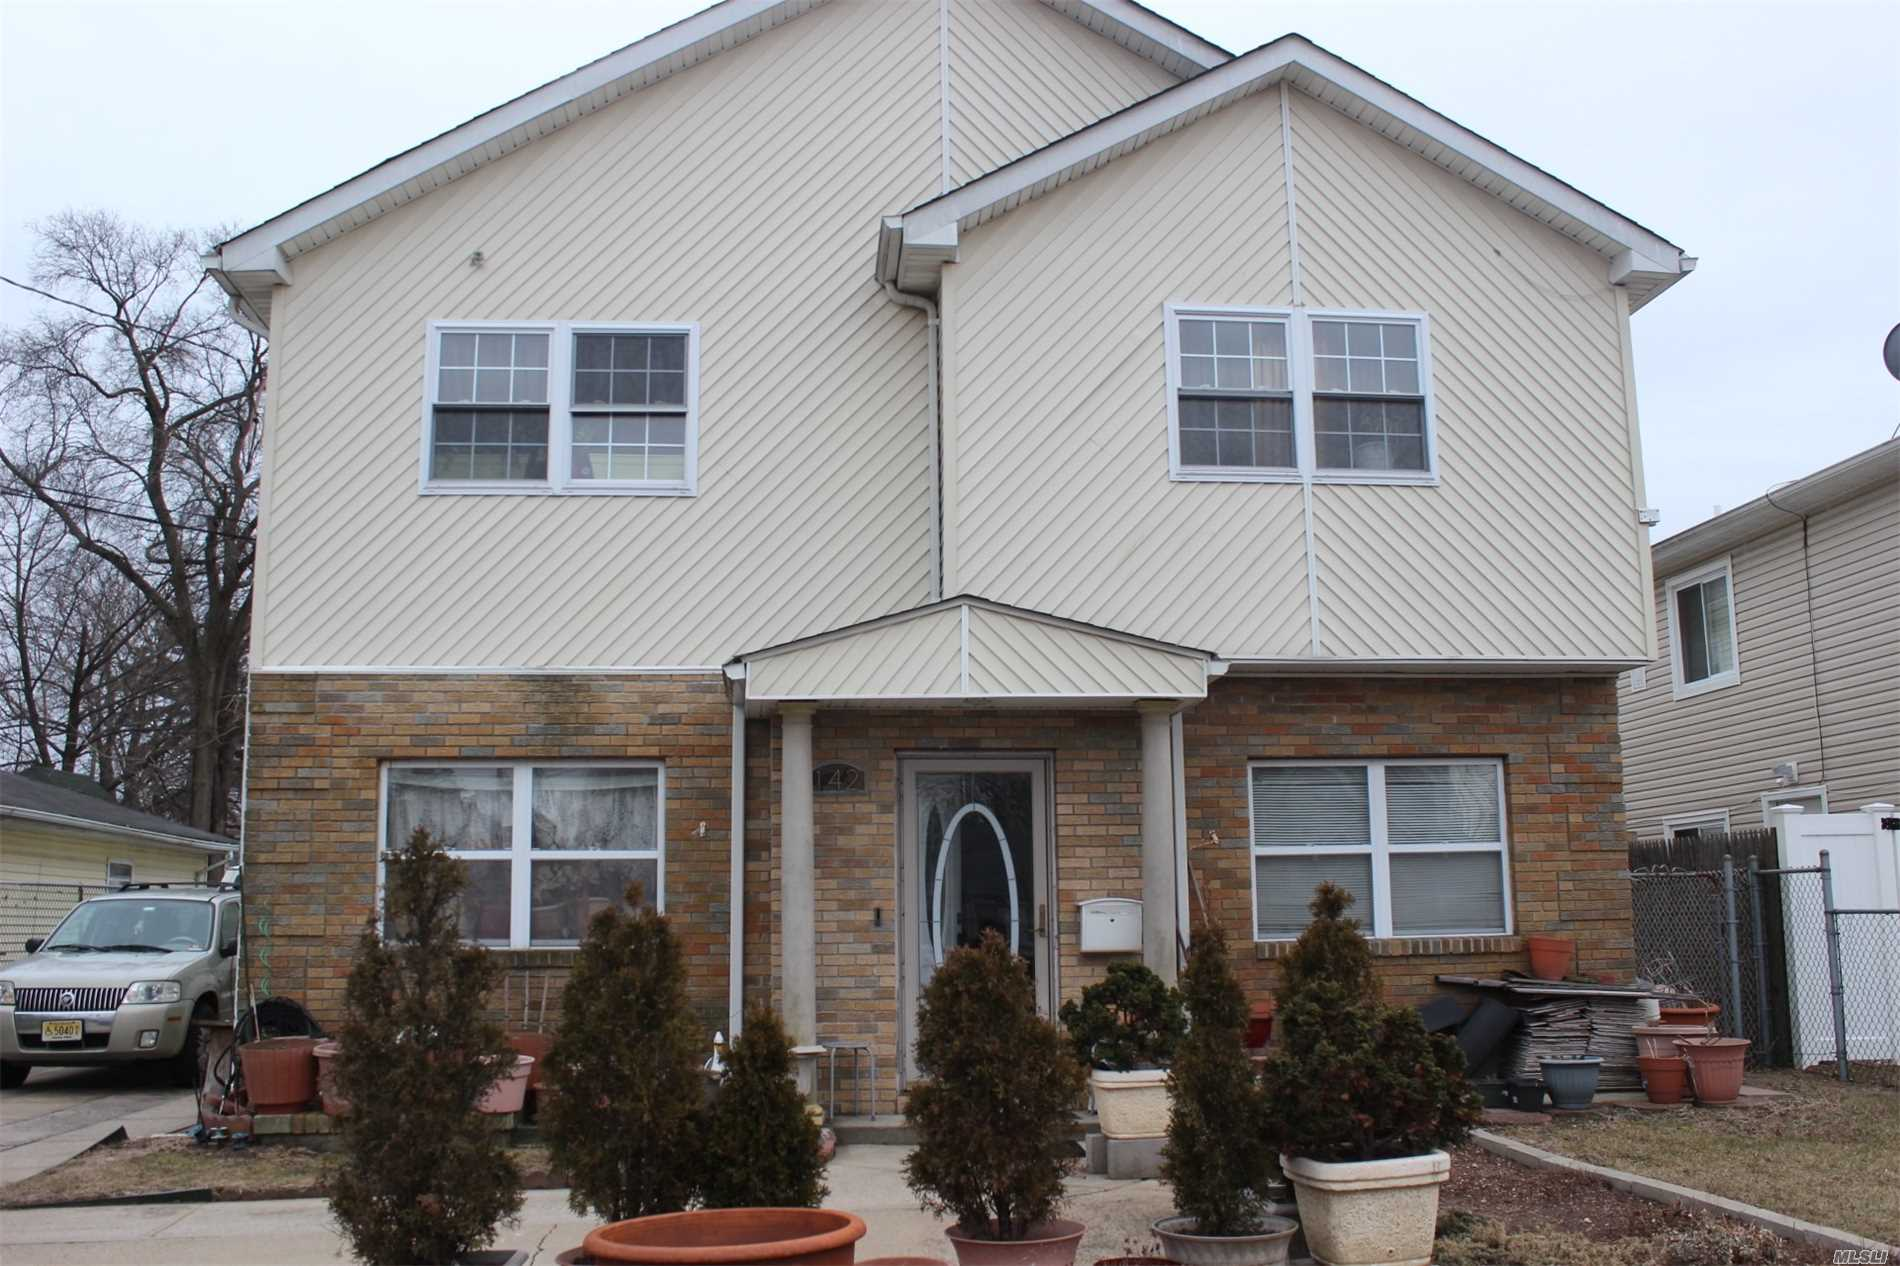 142 E Graham Ave - Hempstead, New York